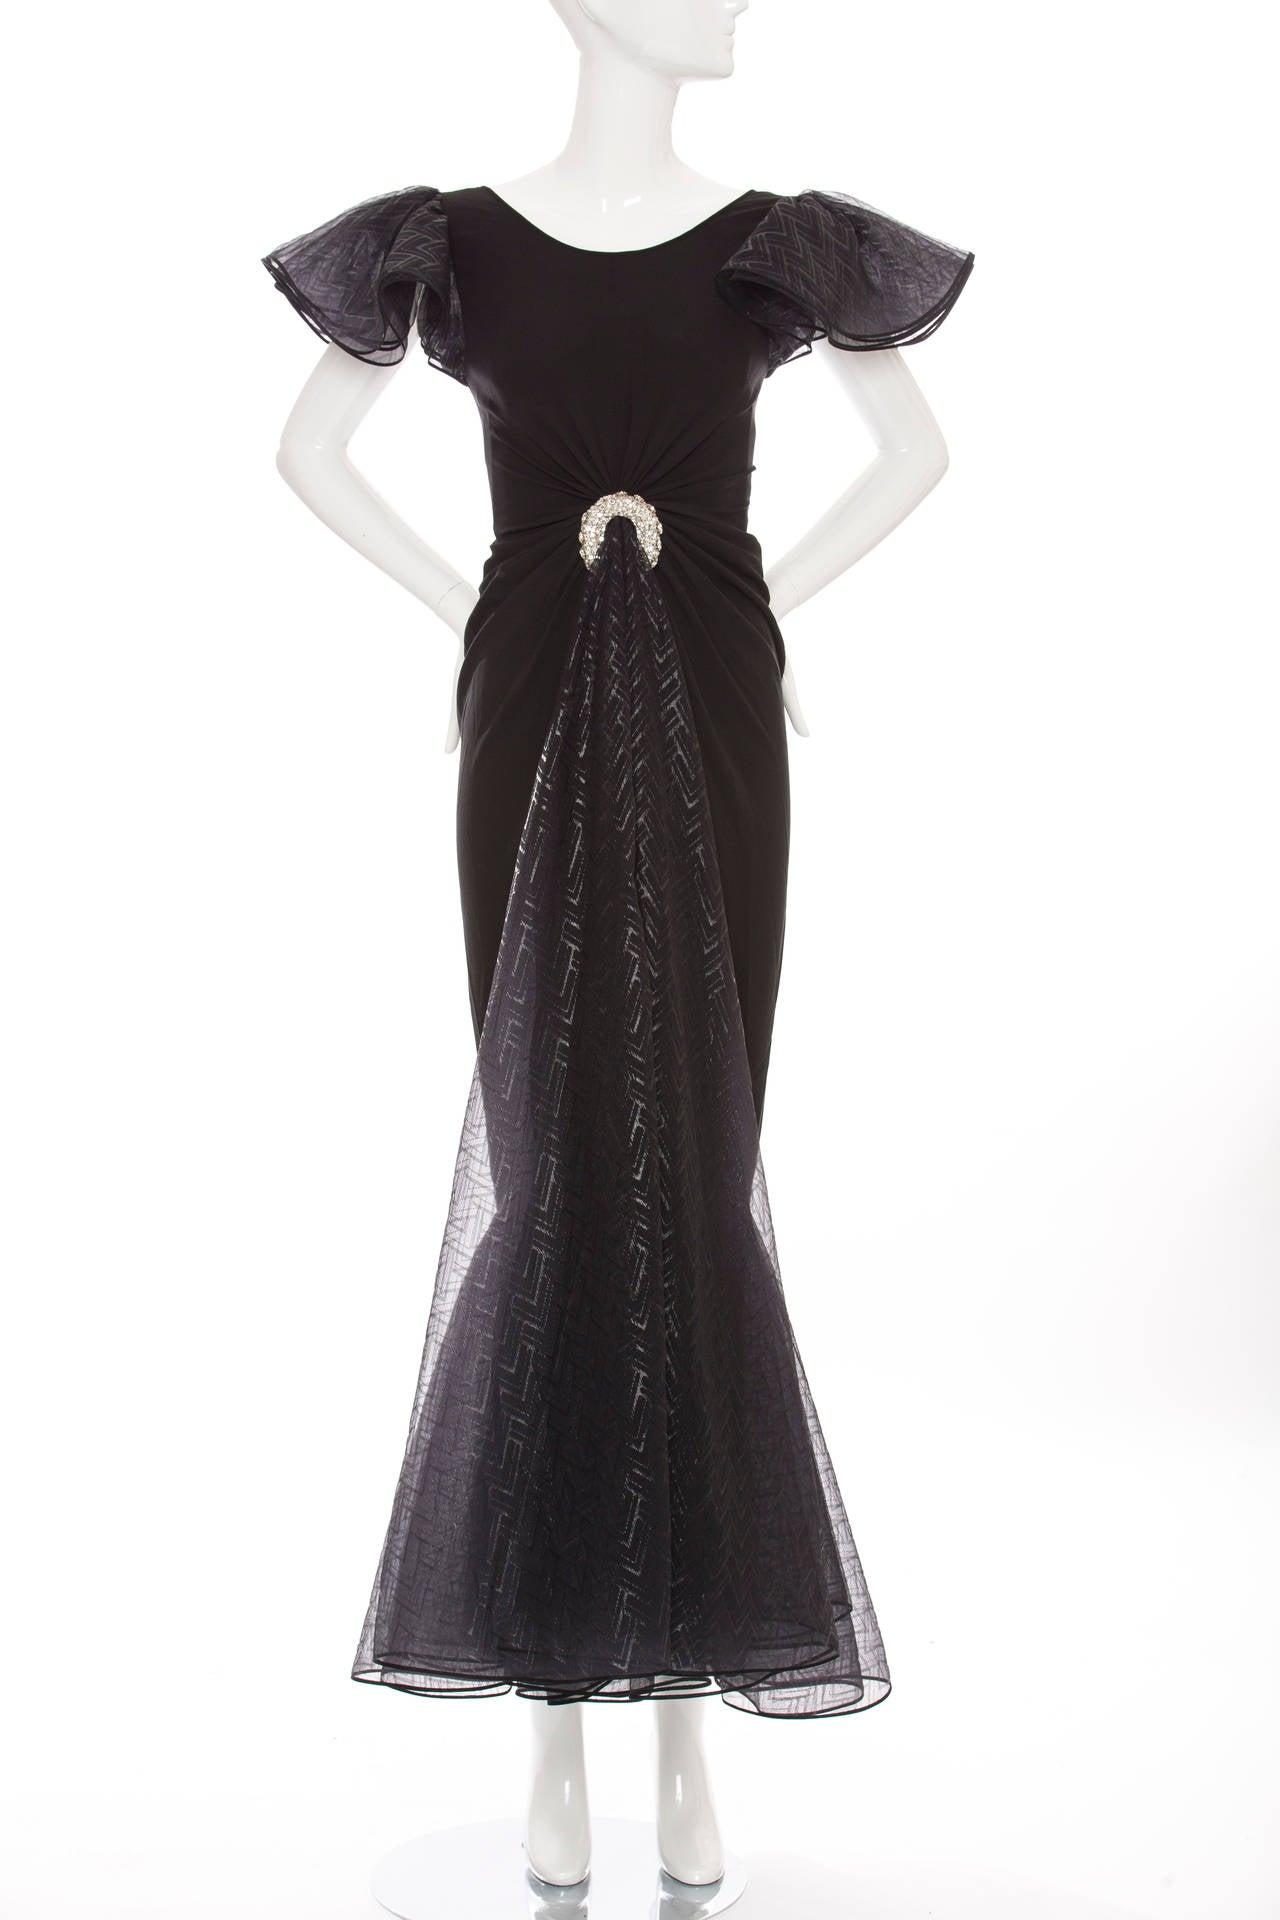 Valentino Haute Couture Silk Crepe And Printed Gazar Evening Dress, Circa 1980's 2